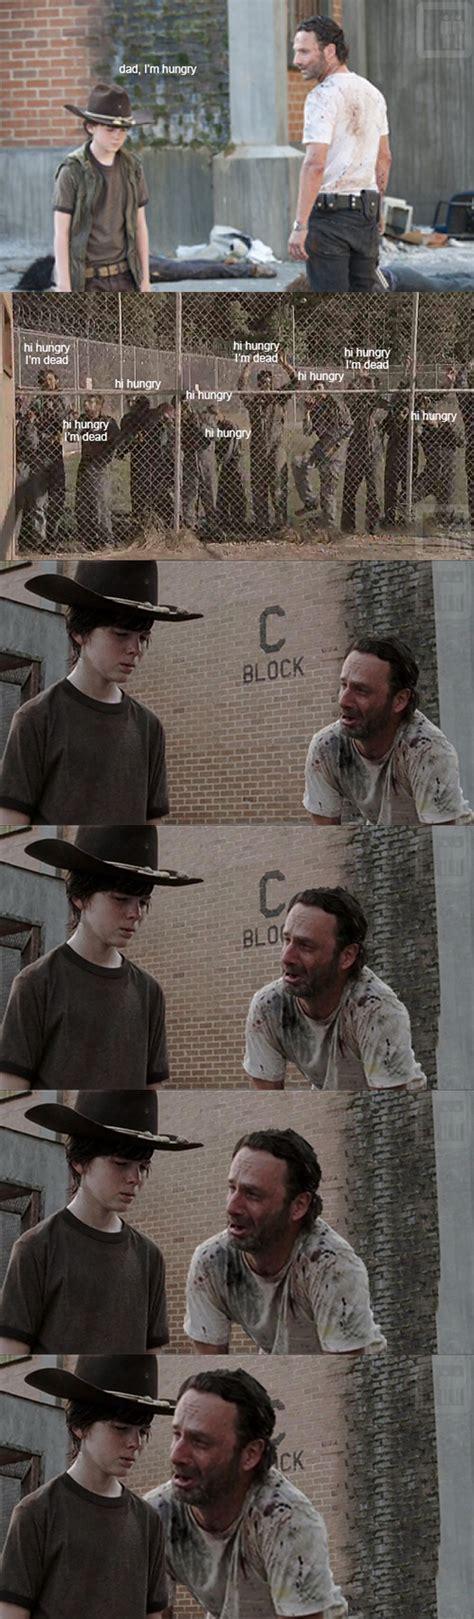 Walking Dead Rick Crying Meme - the classic walking dead meme will always be funny